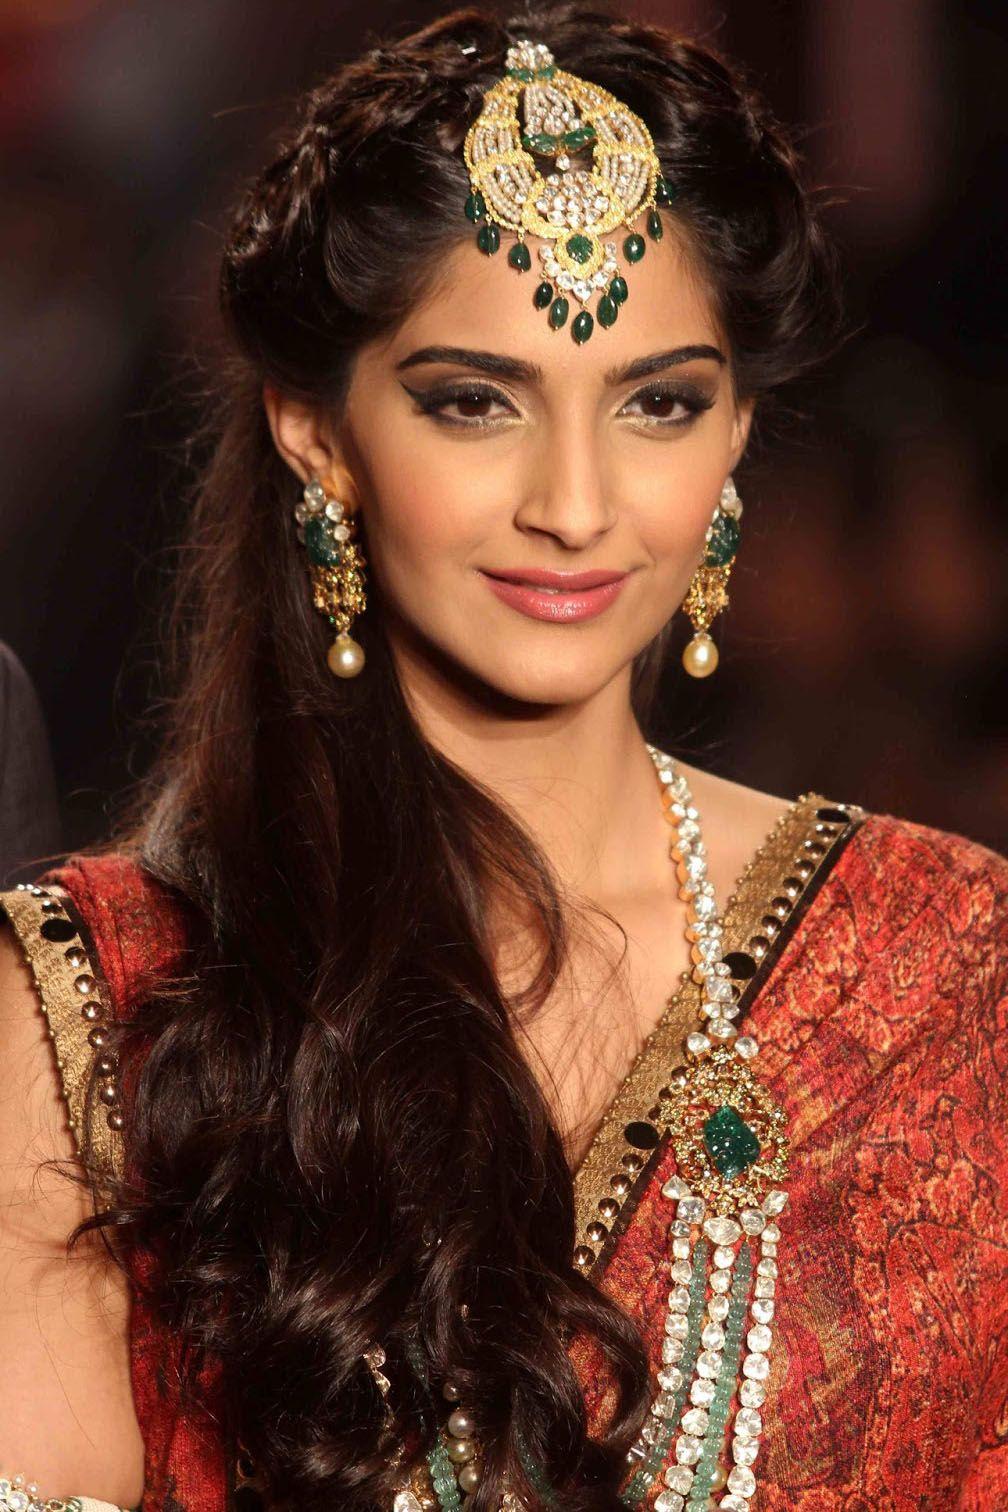 sonam kapoor ramp walk - data download | bollywood actress